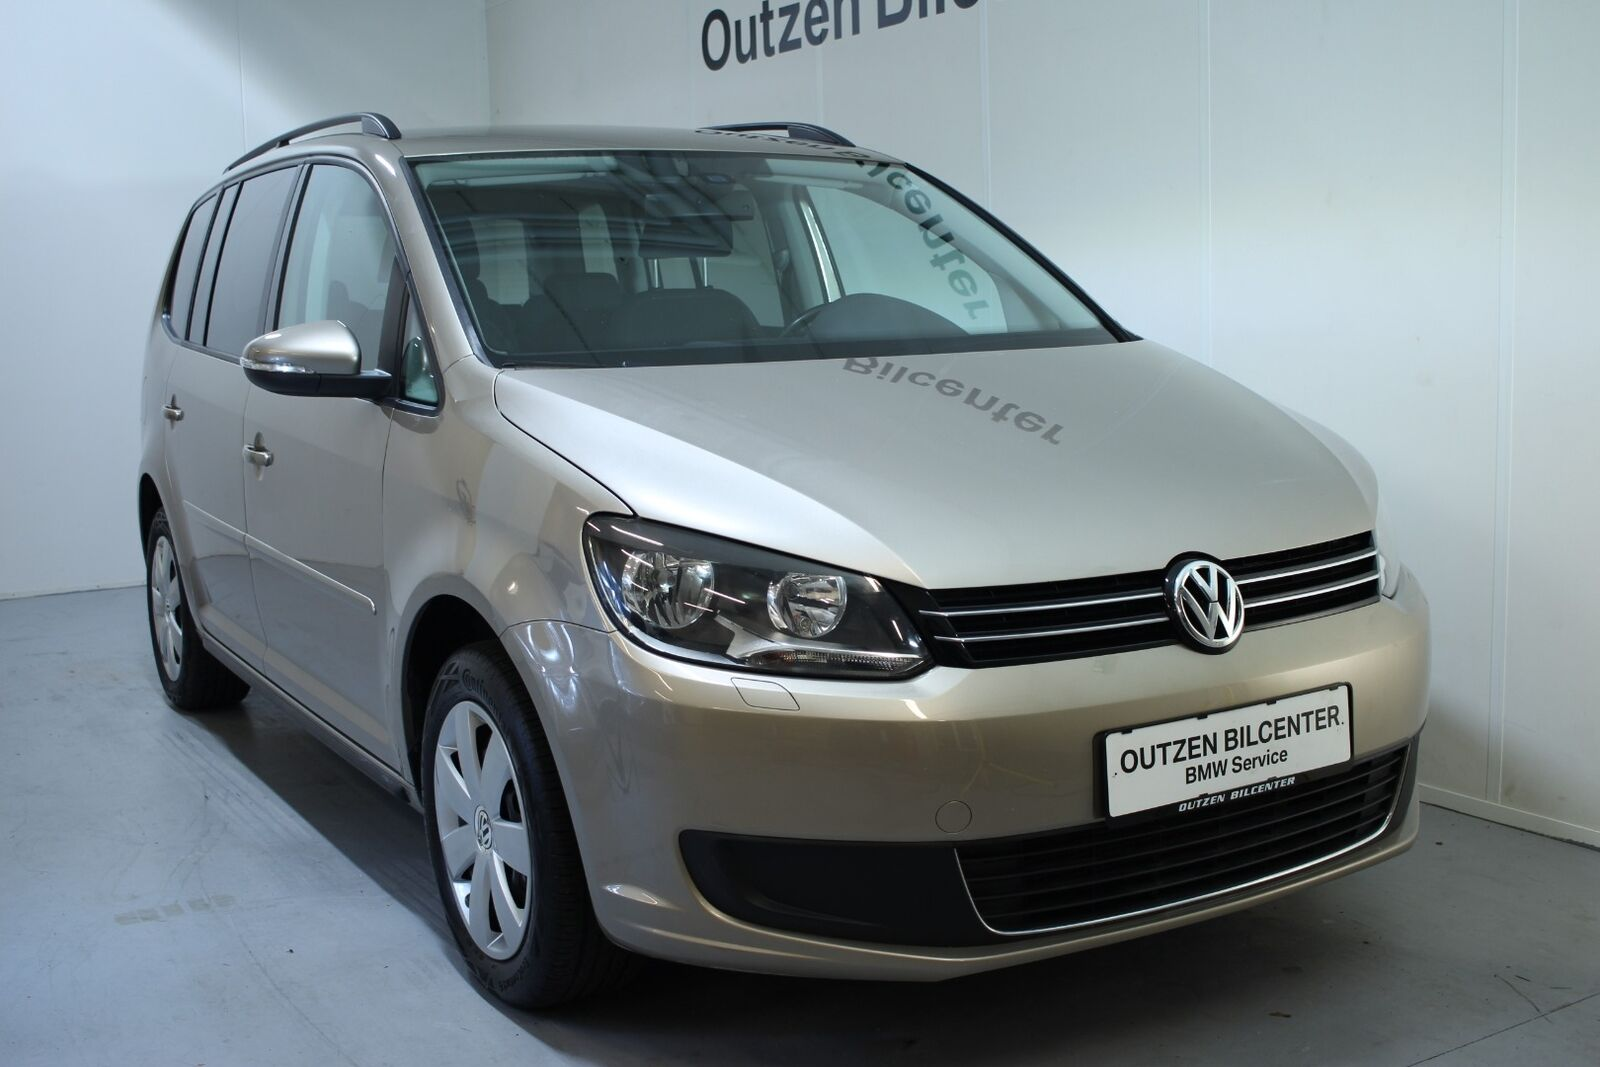 VW Touran 1,6 TDi 105 Comfortline BMT 7prs 5d - 144.900 kr.